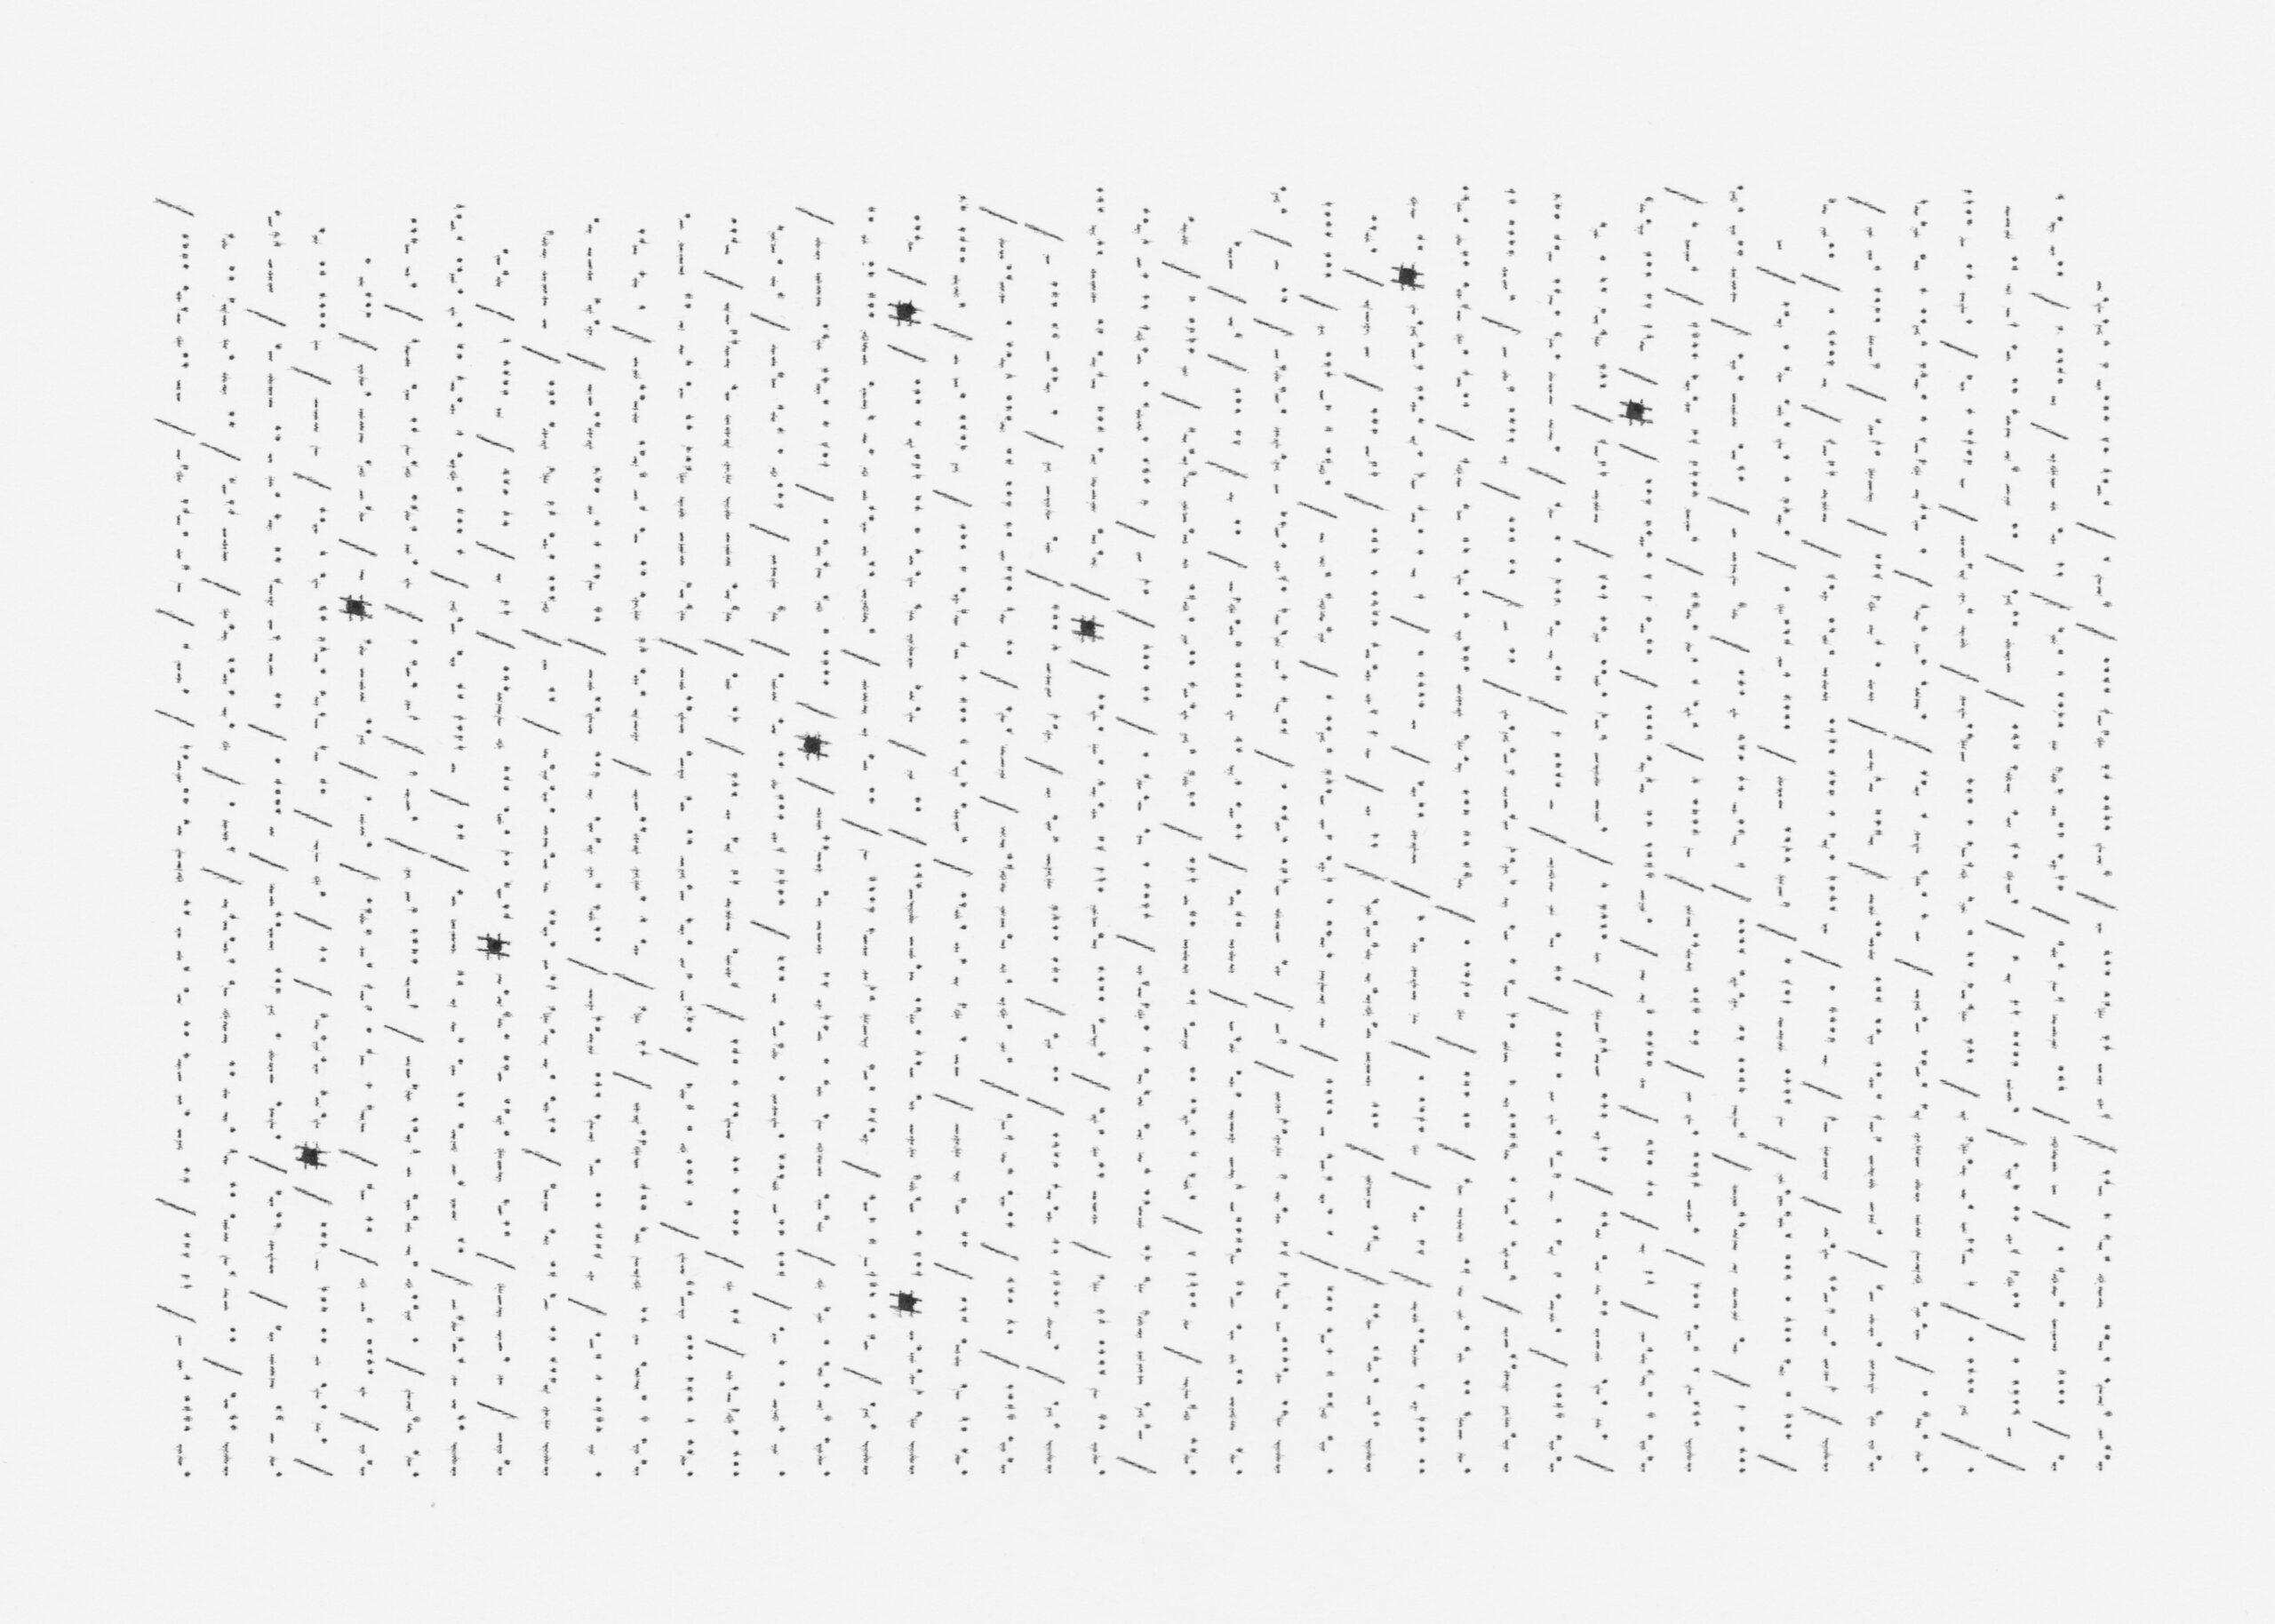 A_2020_04_23_scans_total_morseknittingScan-3